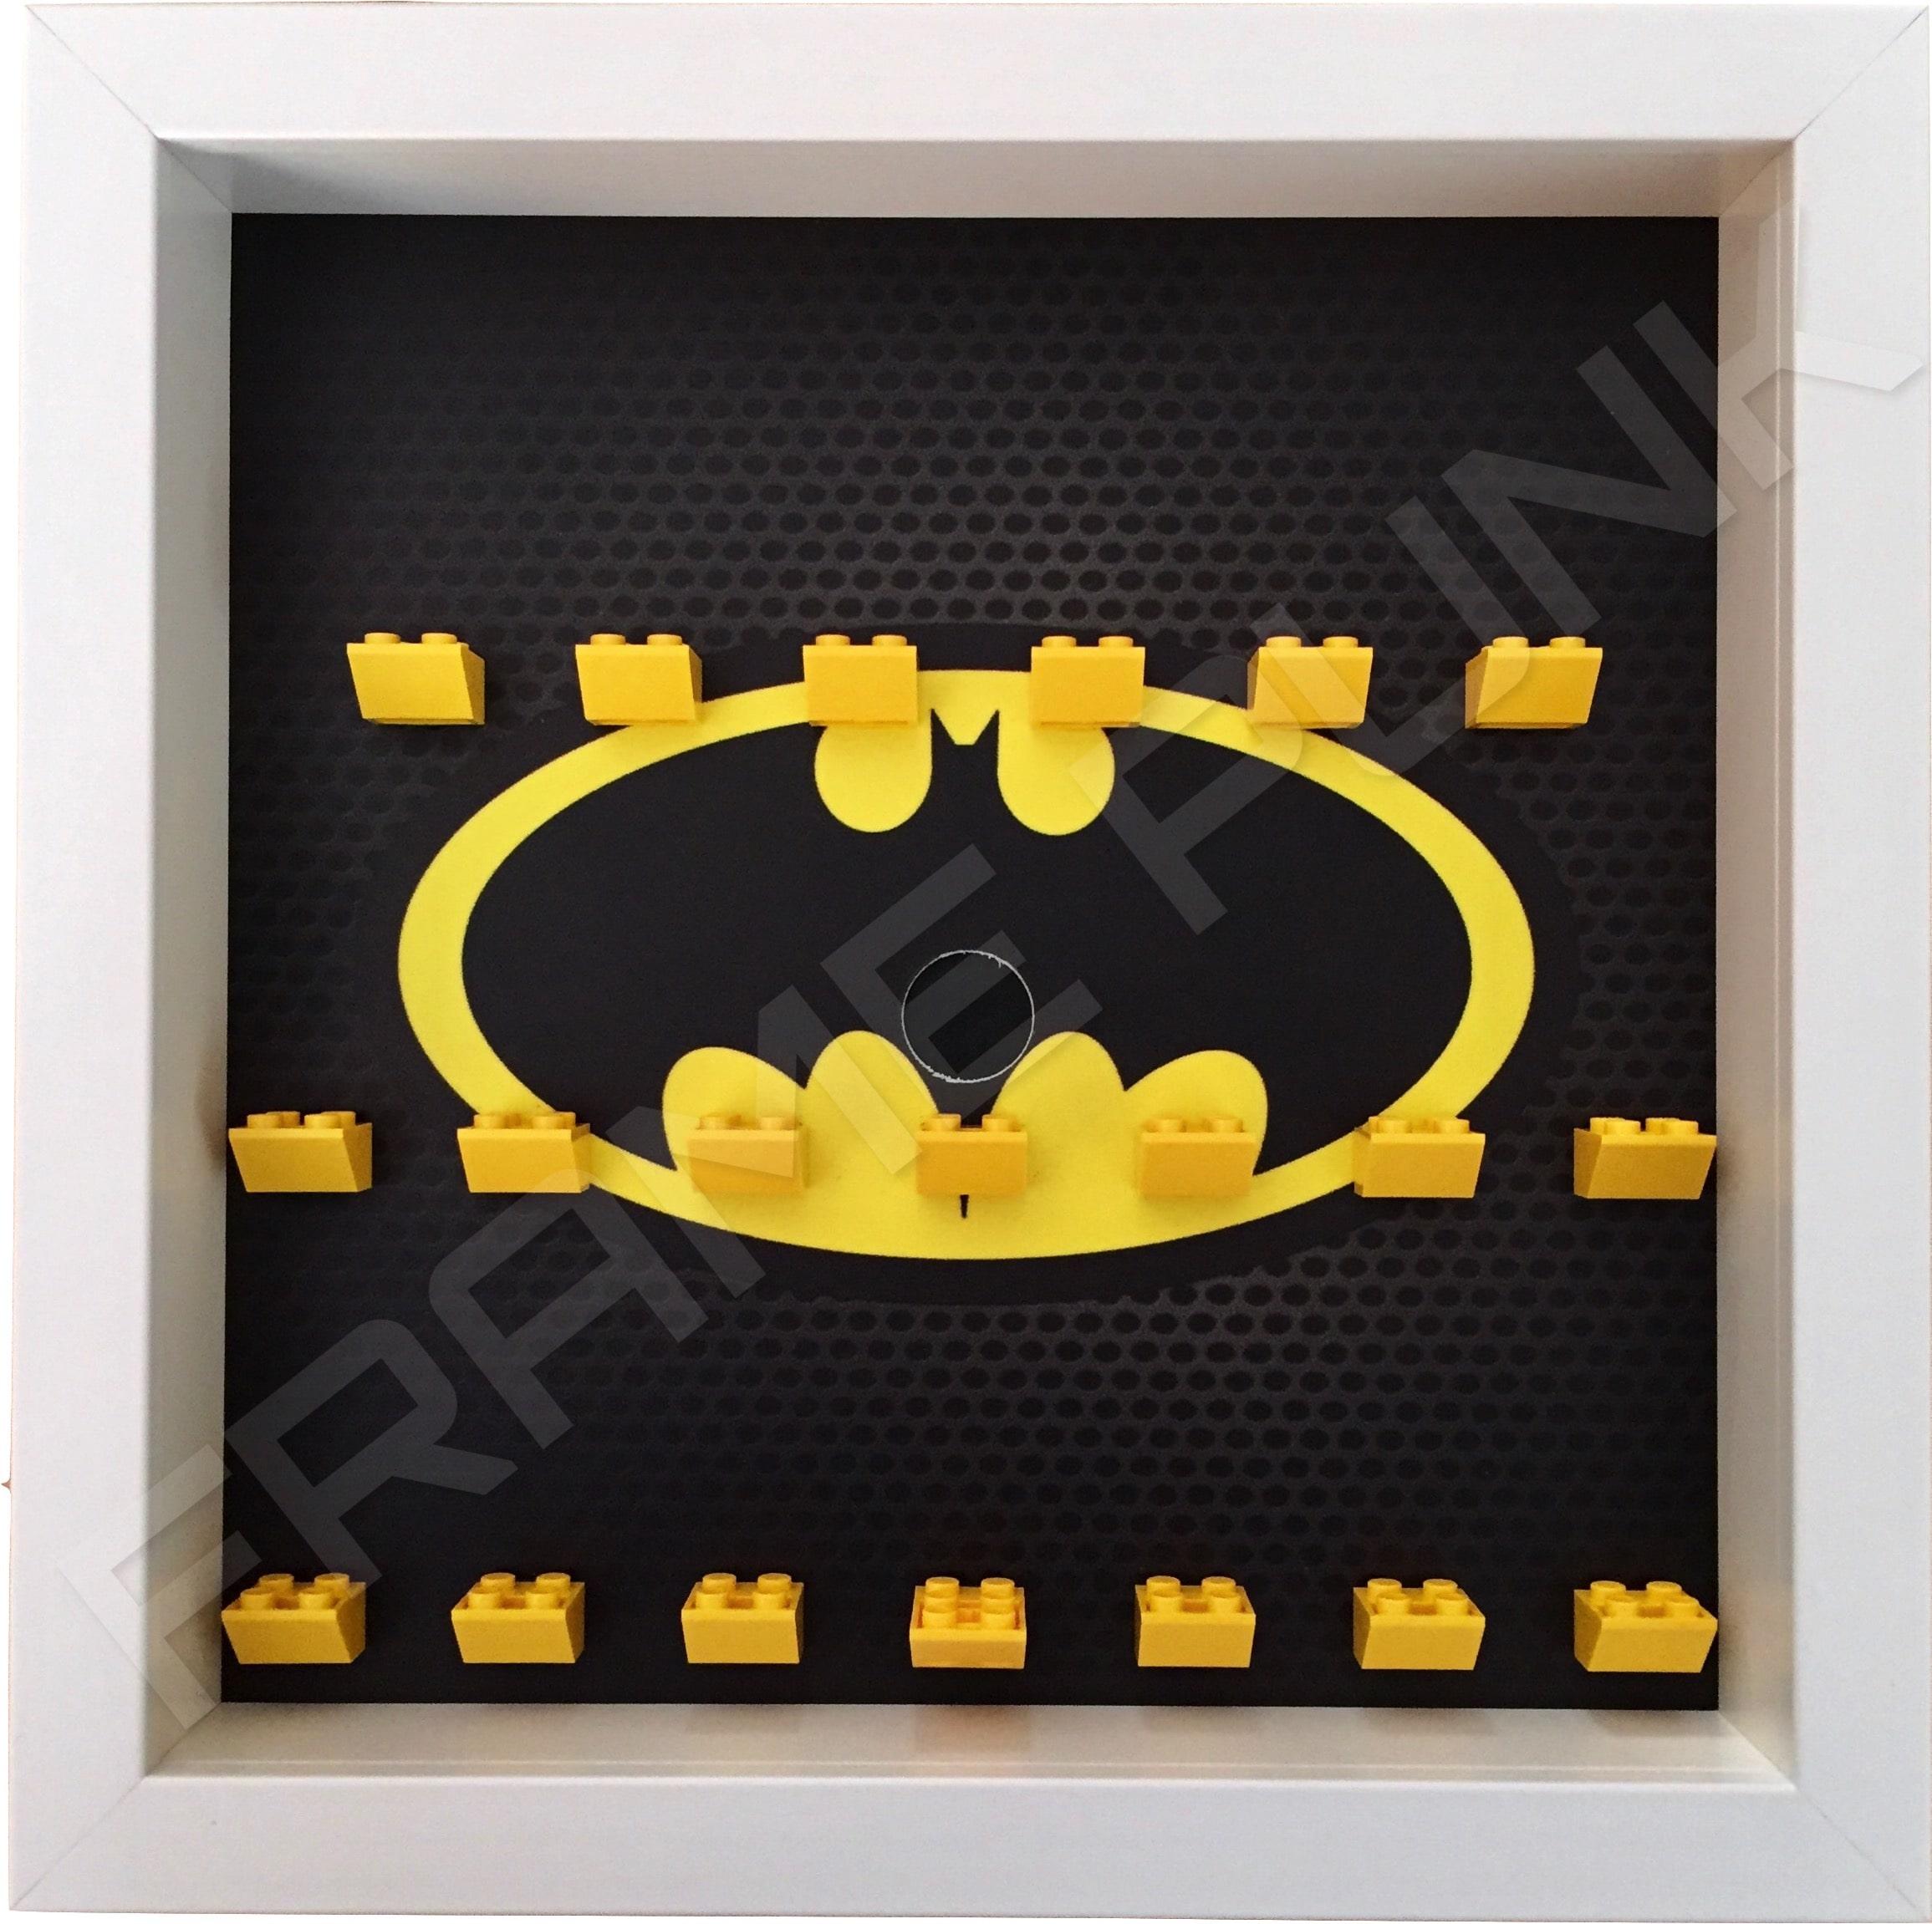 Classic Lego Batman Movie Display Frame White Frame Punk